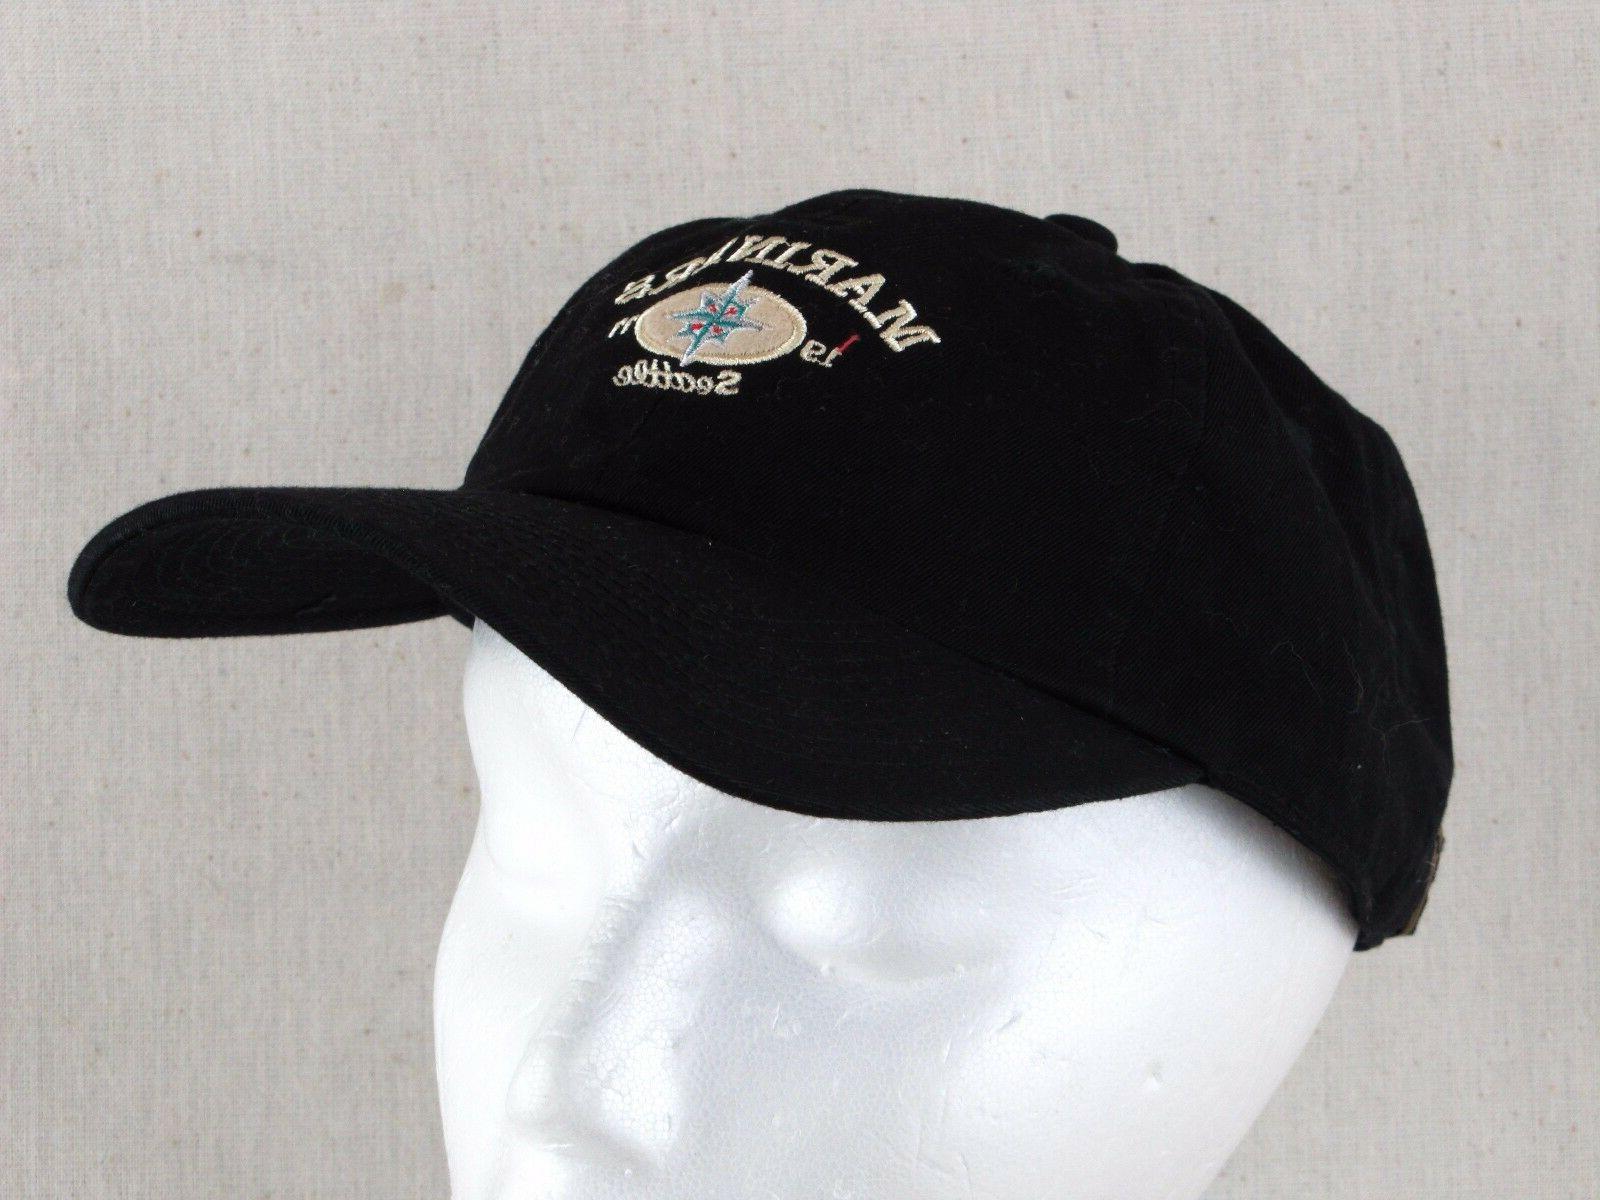 seattle mariners press box suite baseball hat